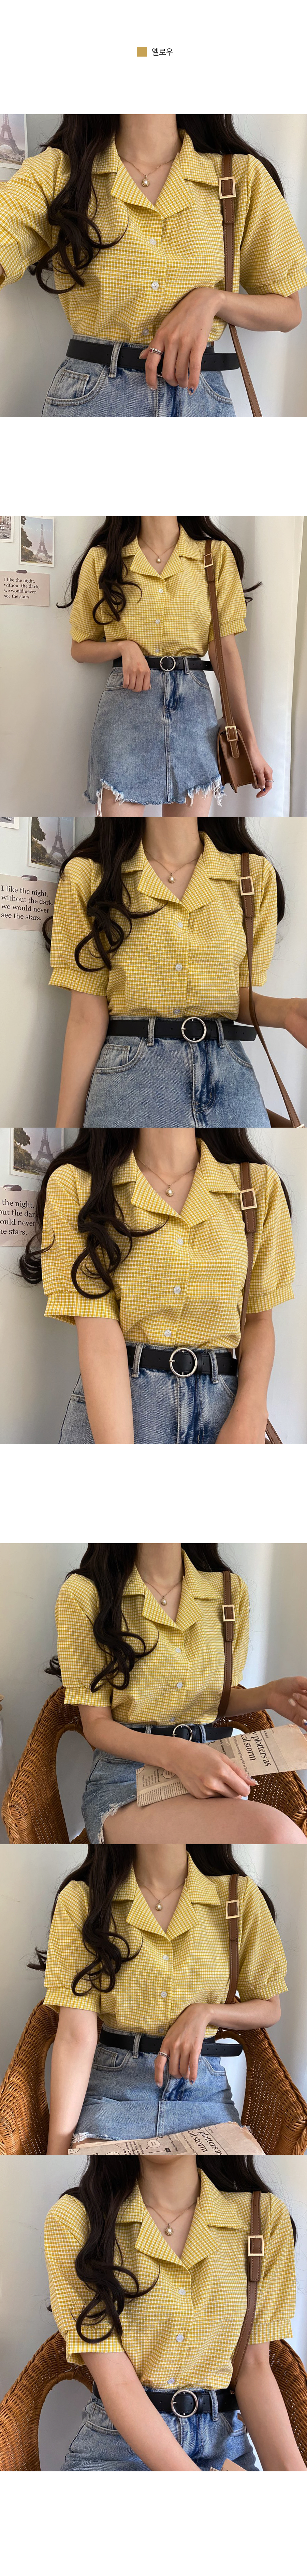 Say light check collar blouse